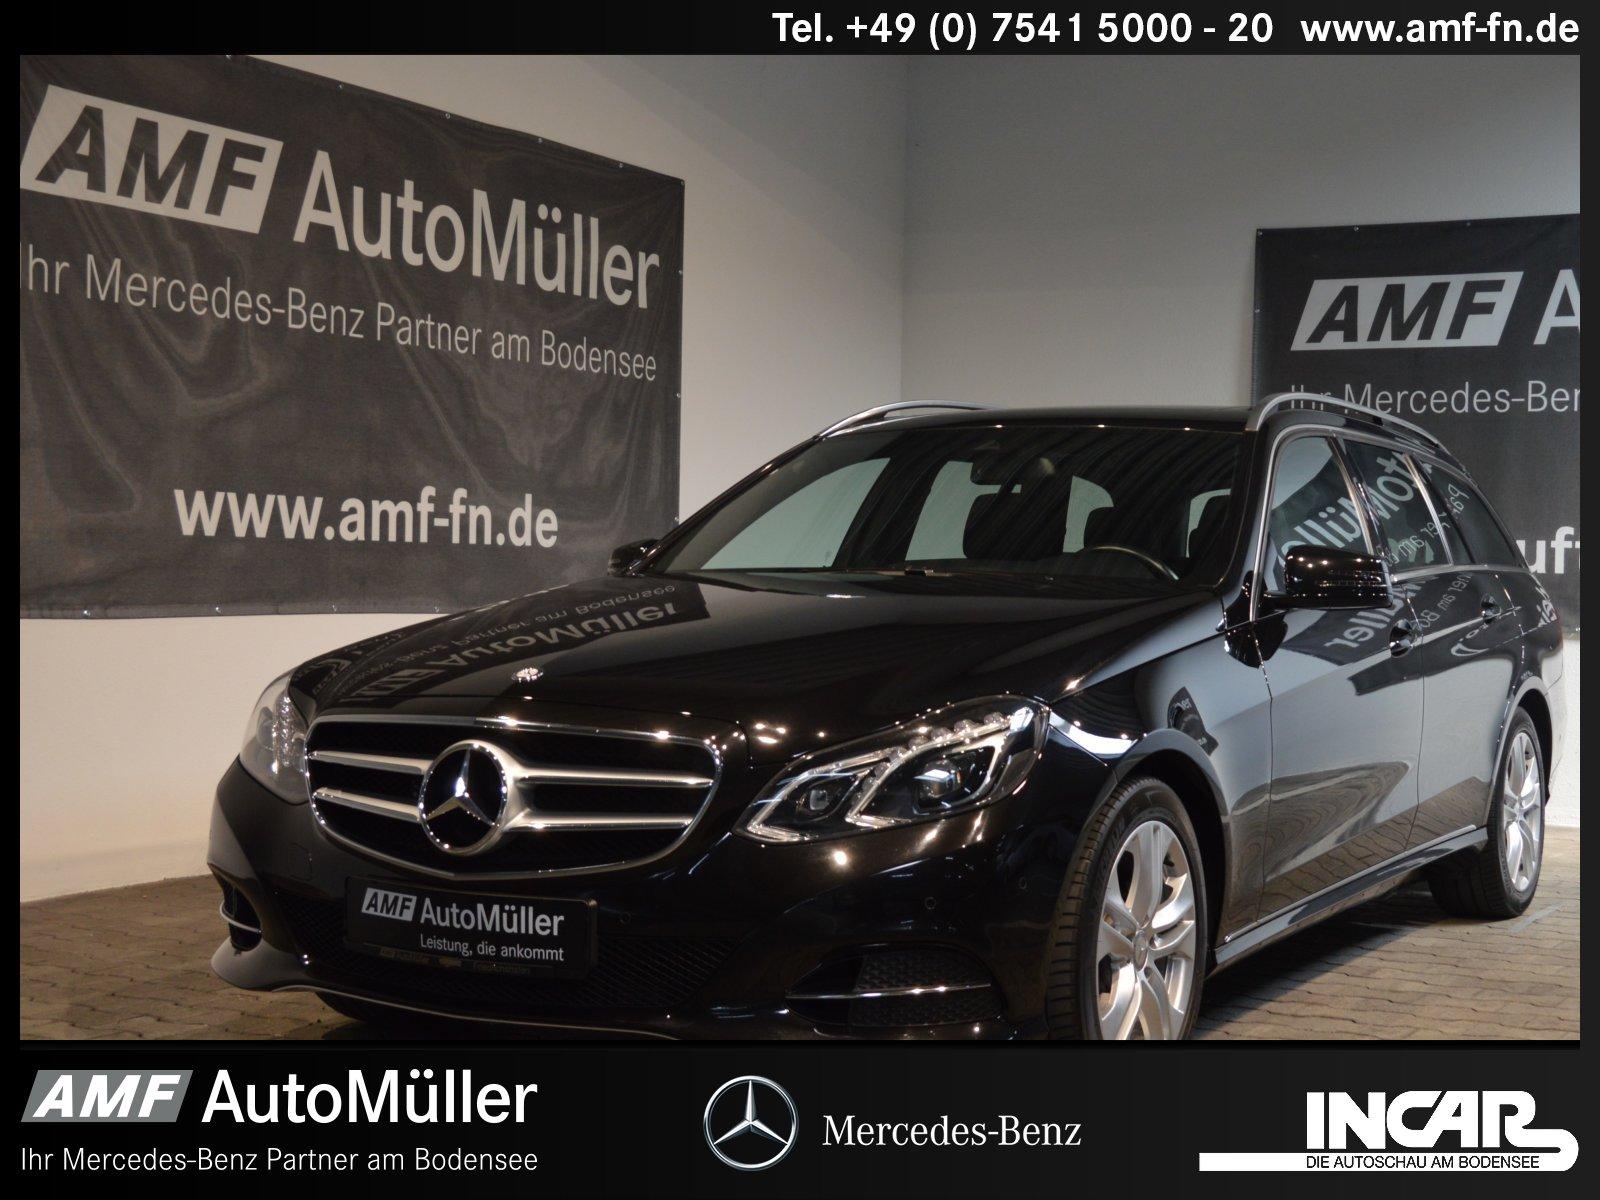 Mercedes-Benz E 220 T CDI Avantgarde AUTOM.+SHD+AHK+LED ILS+, Jahr 2014, Diesel